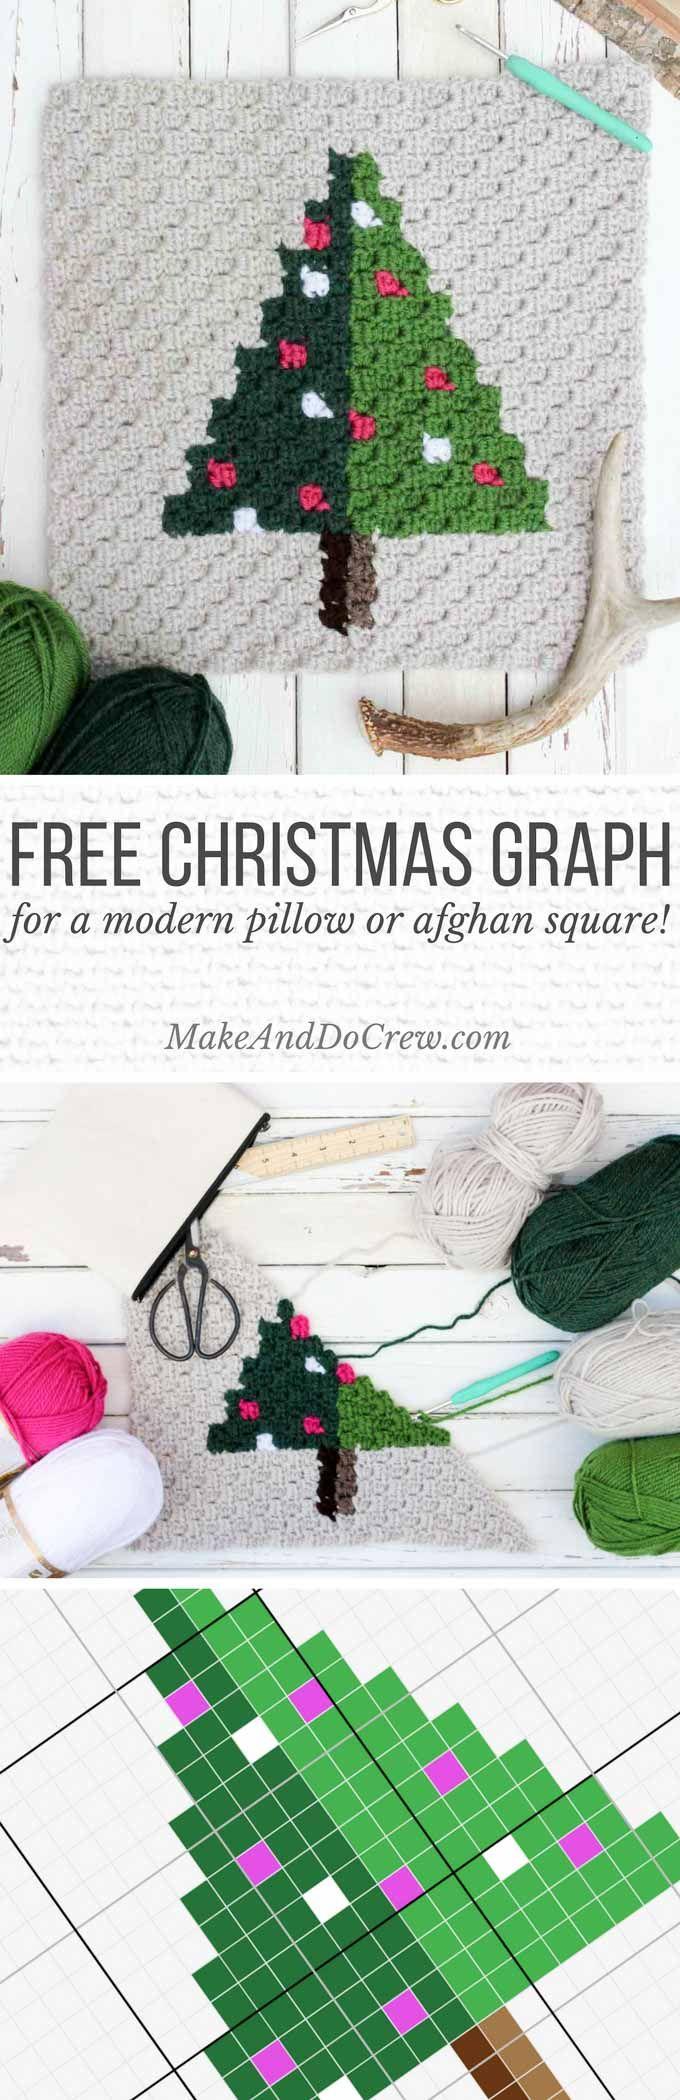 Free Printable Christmas Crochet Patterns – Festival Collections - Free Printable Christmas Crochet Patterns